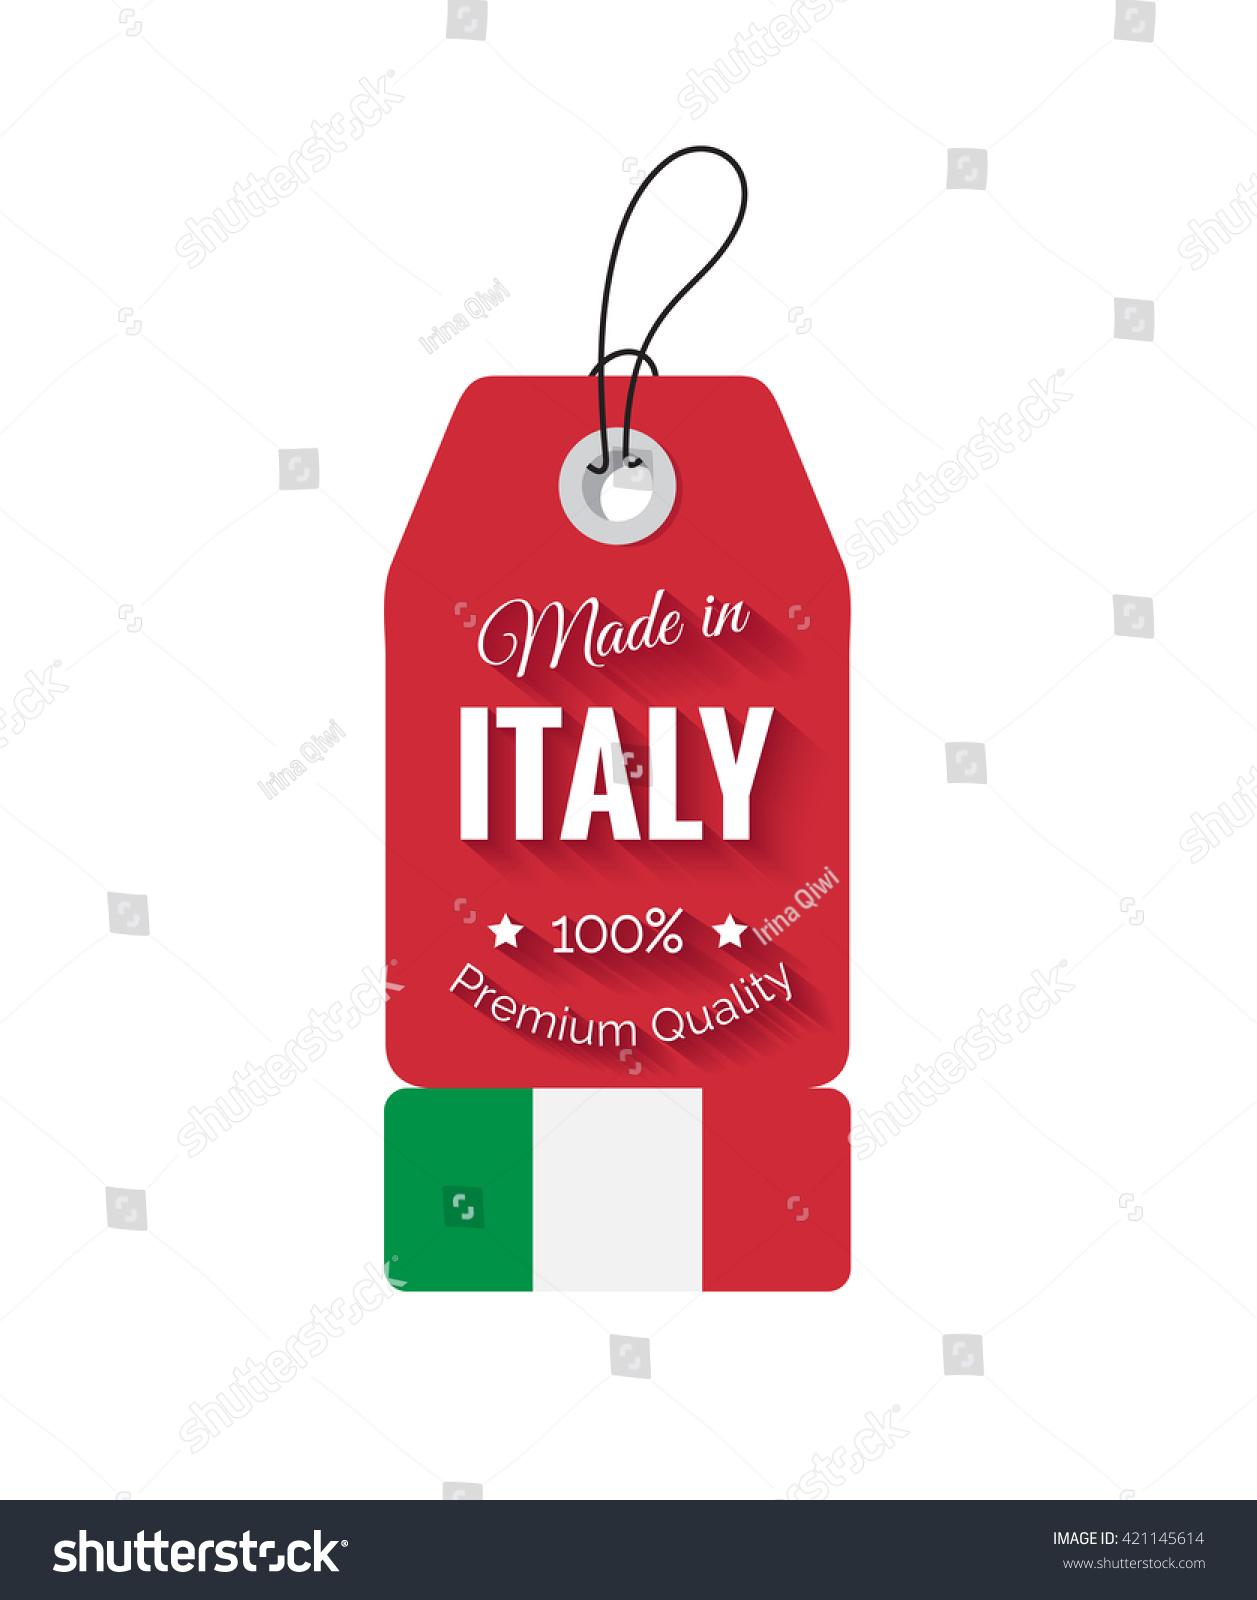 Online image photo editor shutterstock editor for Made com italia